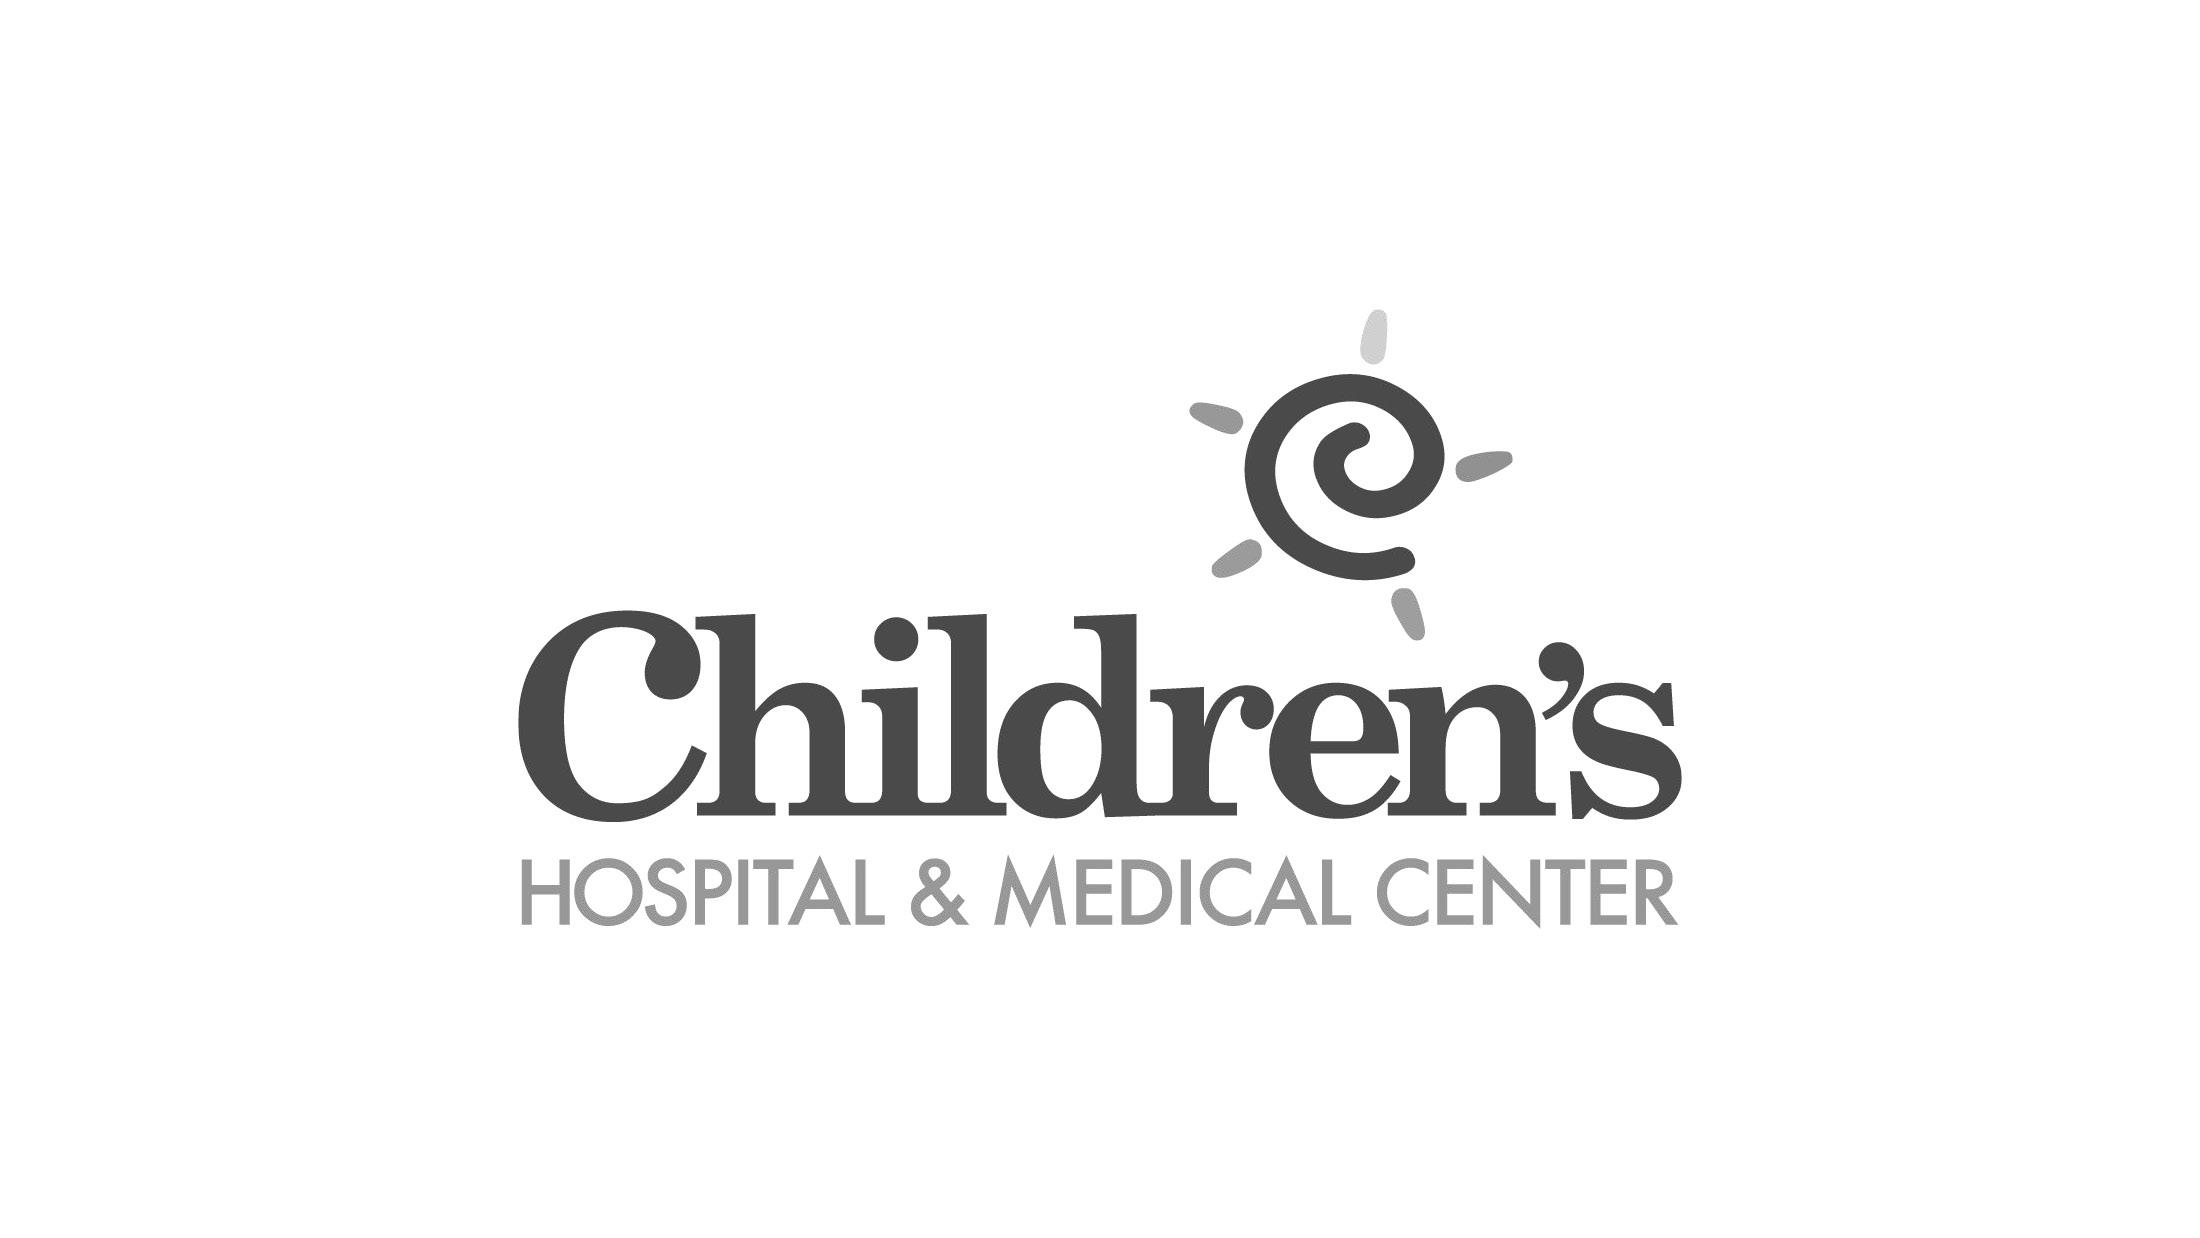 Children's hospital & medical center logo with Sun icon